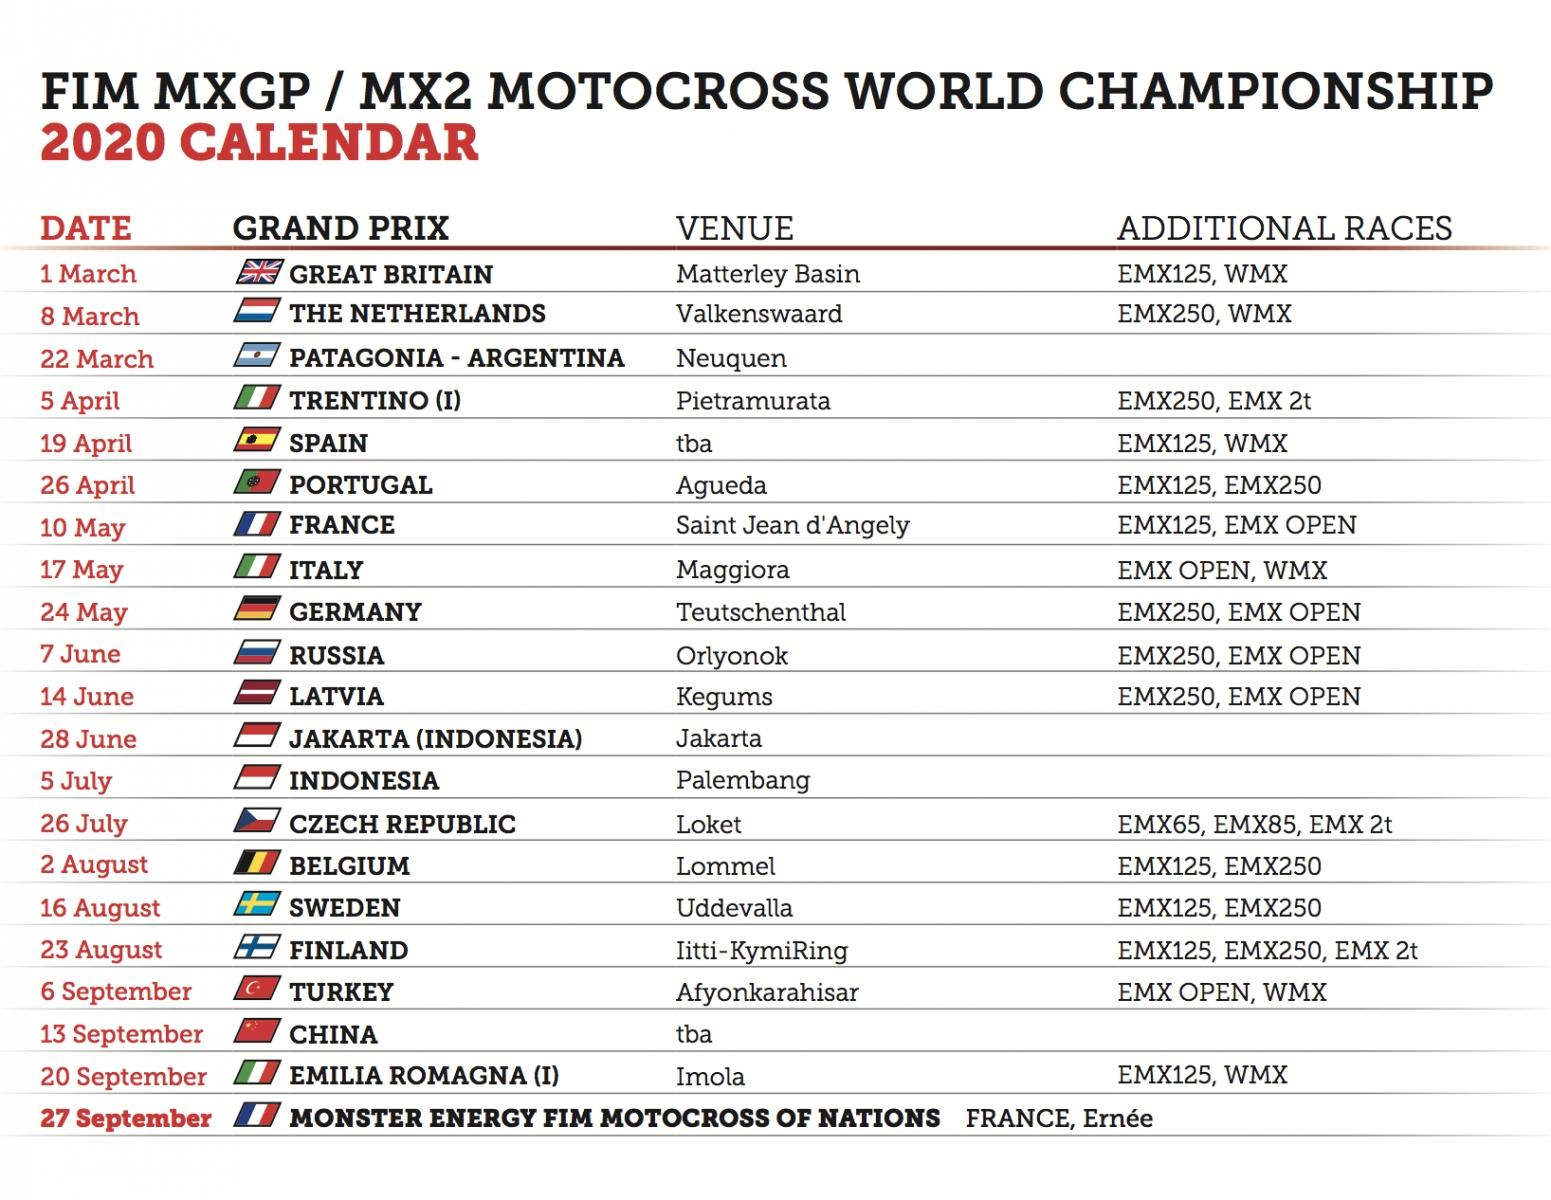 2020 Fim Motocross World Championship Official Calendar | Mxgp